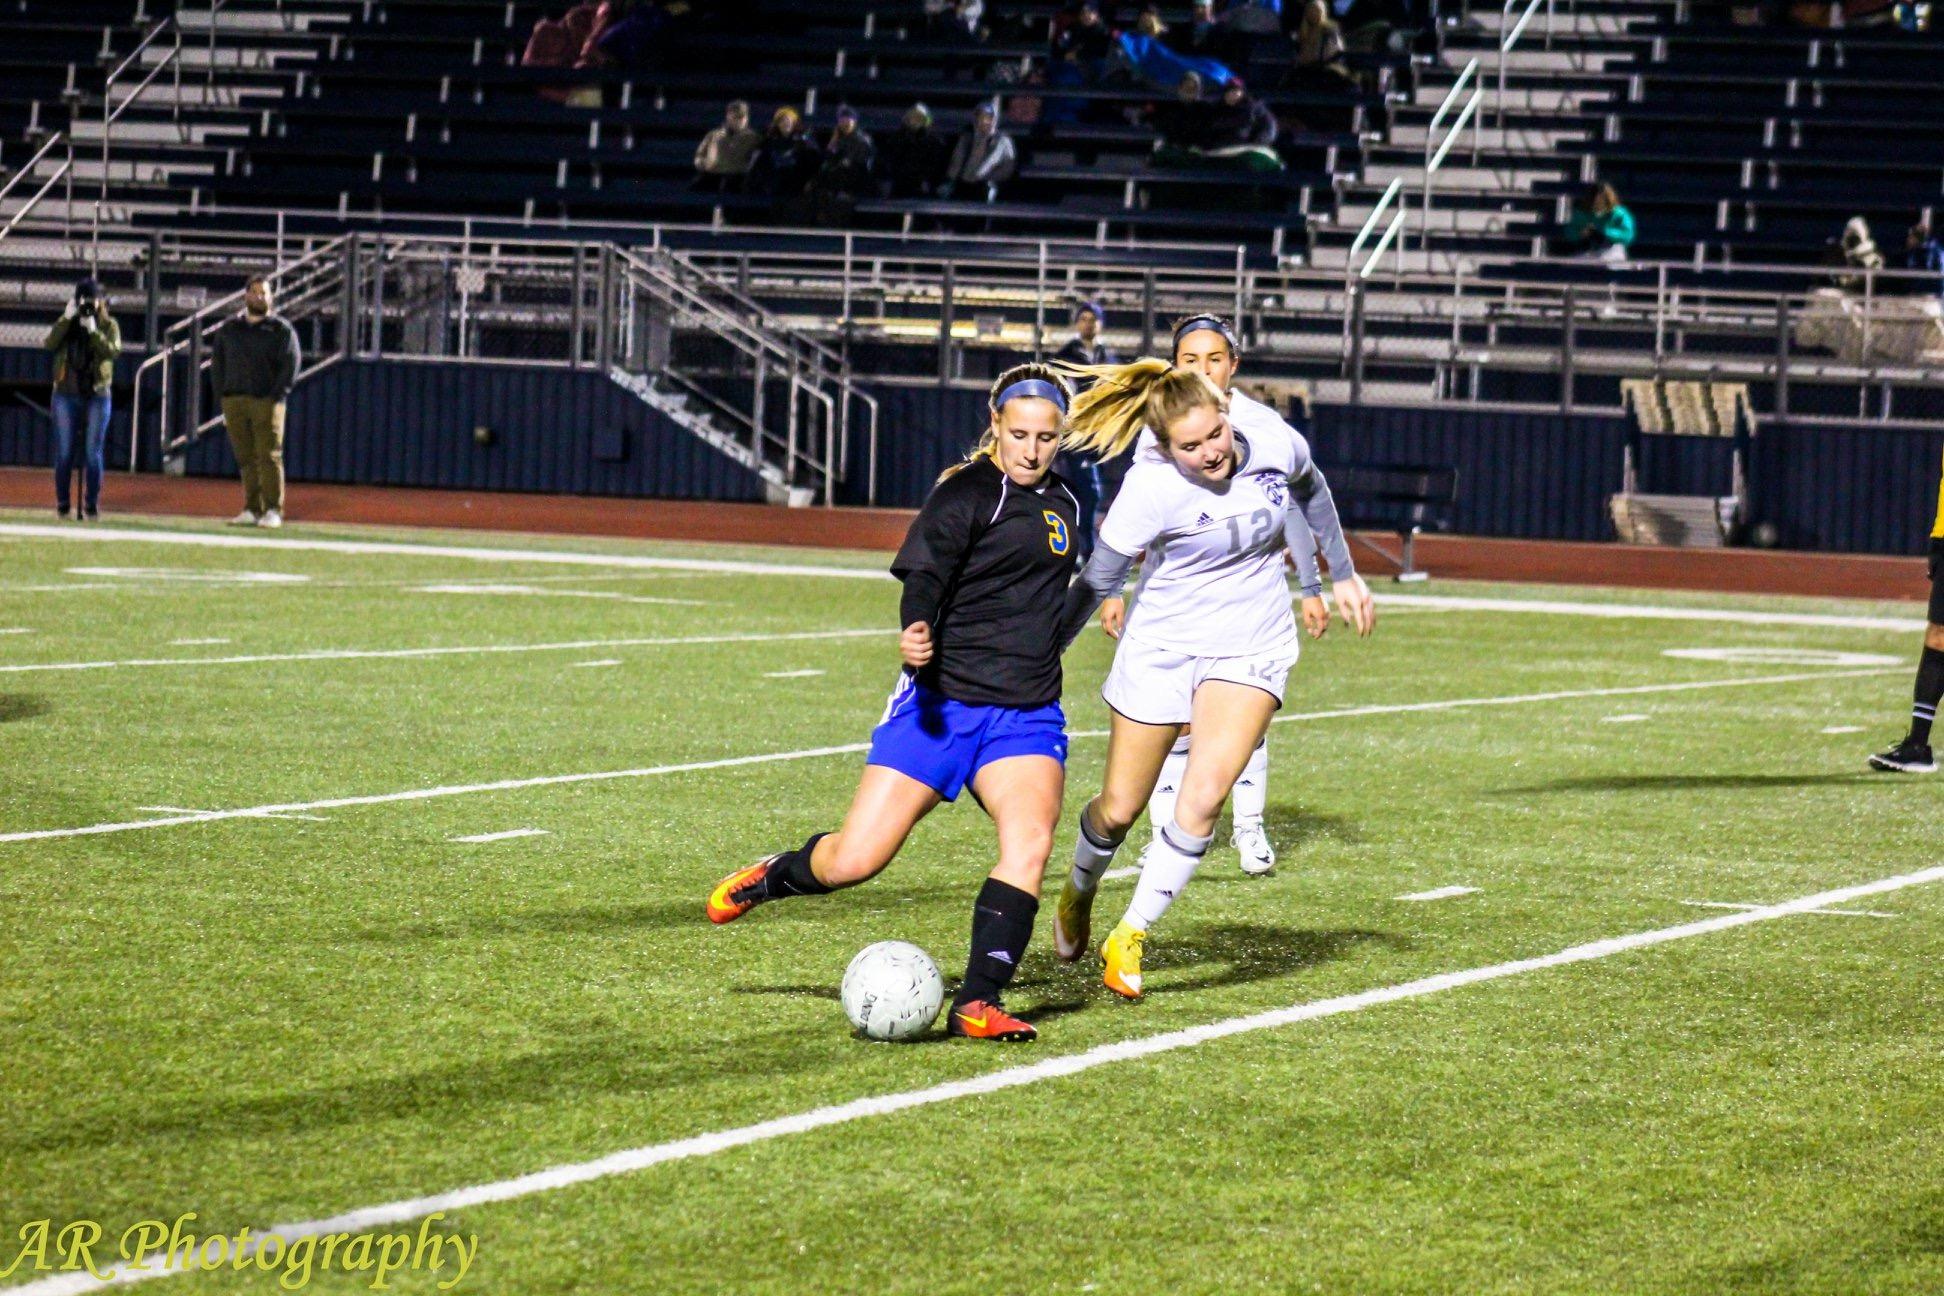 Kylea Basden lines up the kick